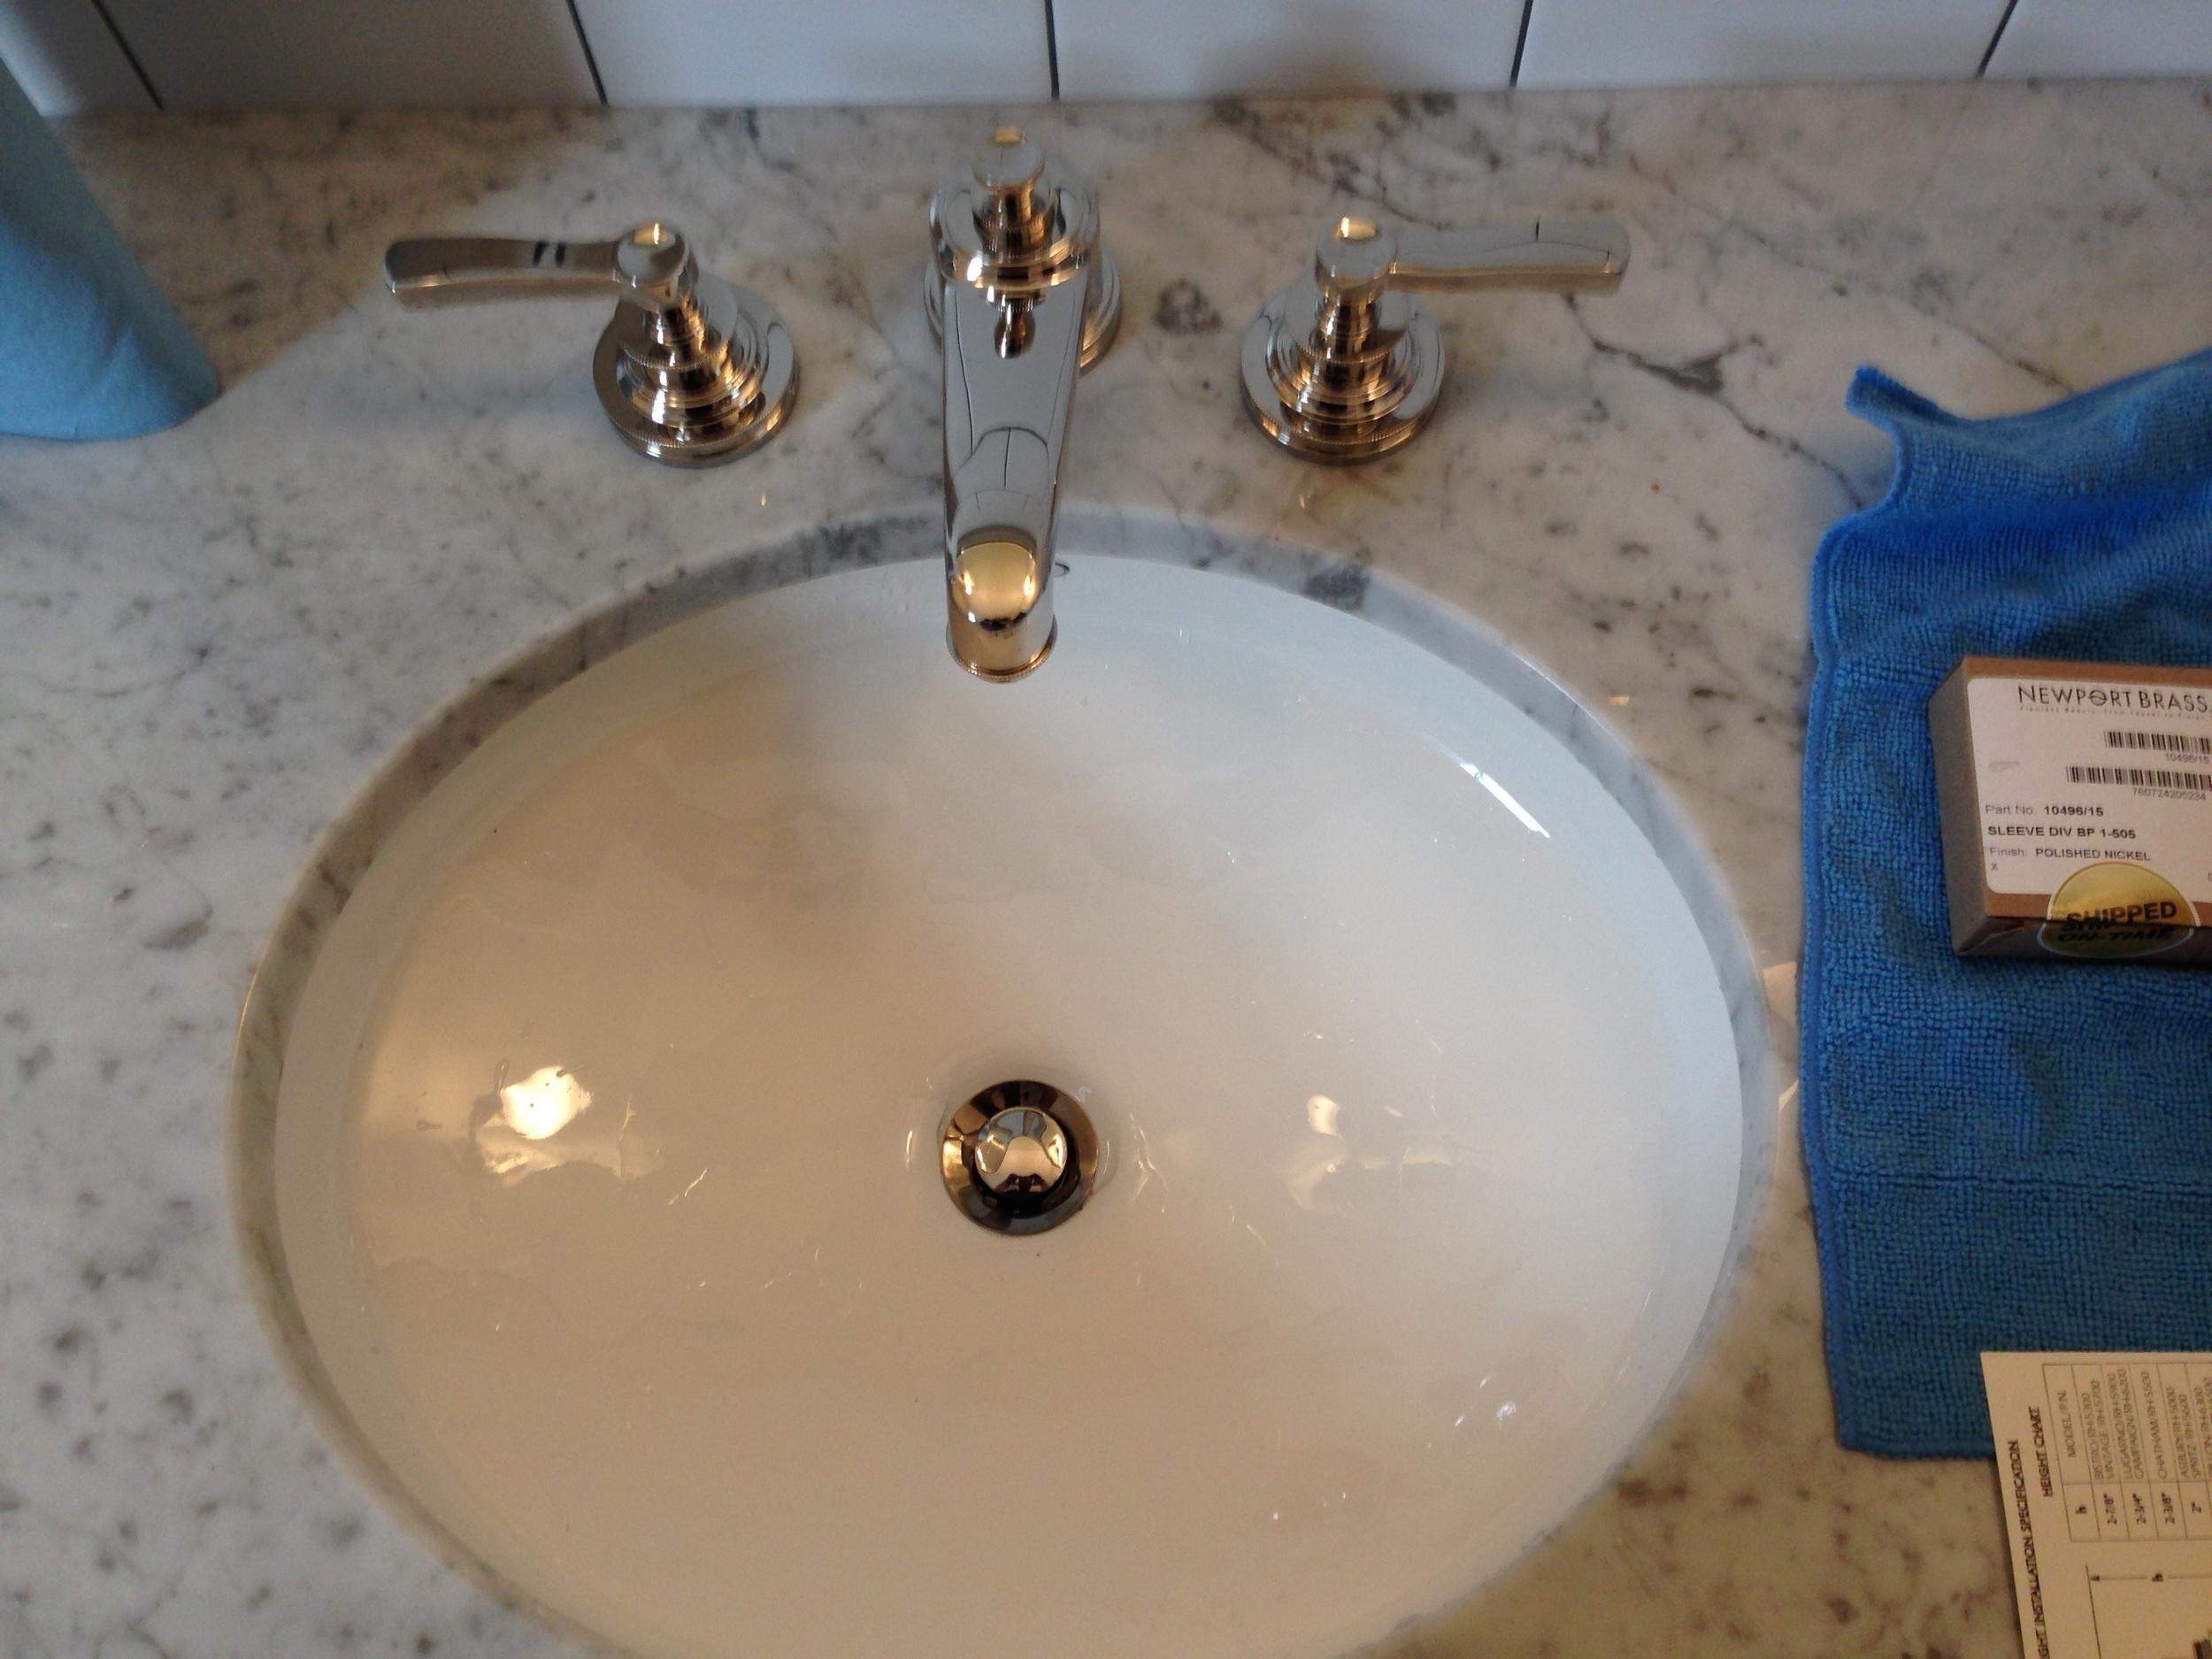 Newport Brass Wide Spread Bathroom faucet Install